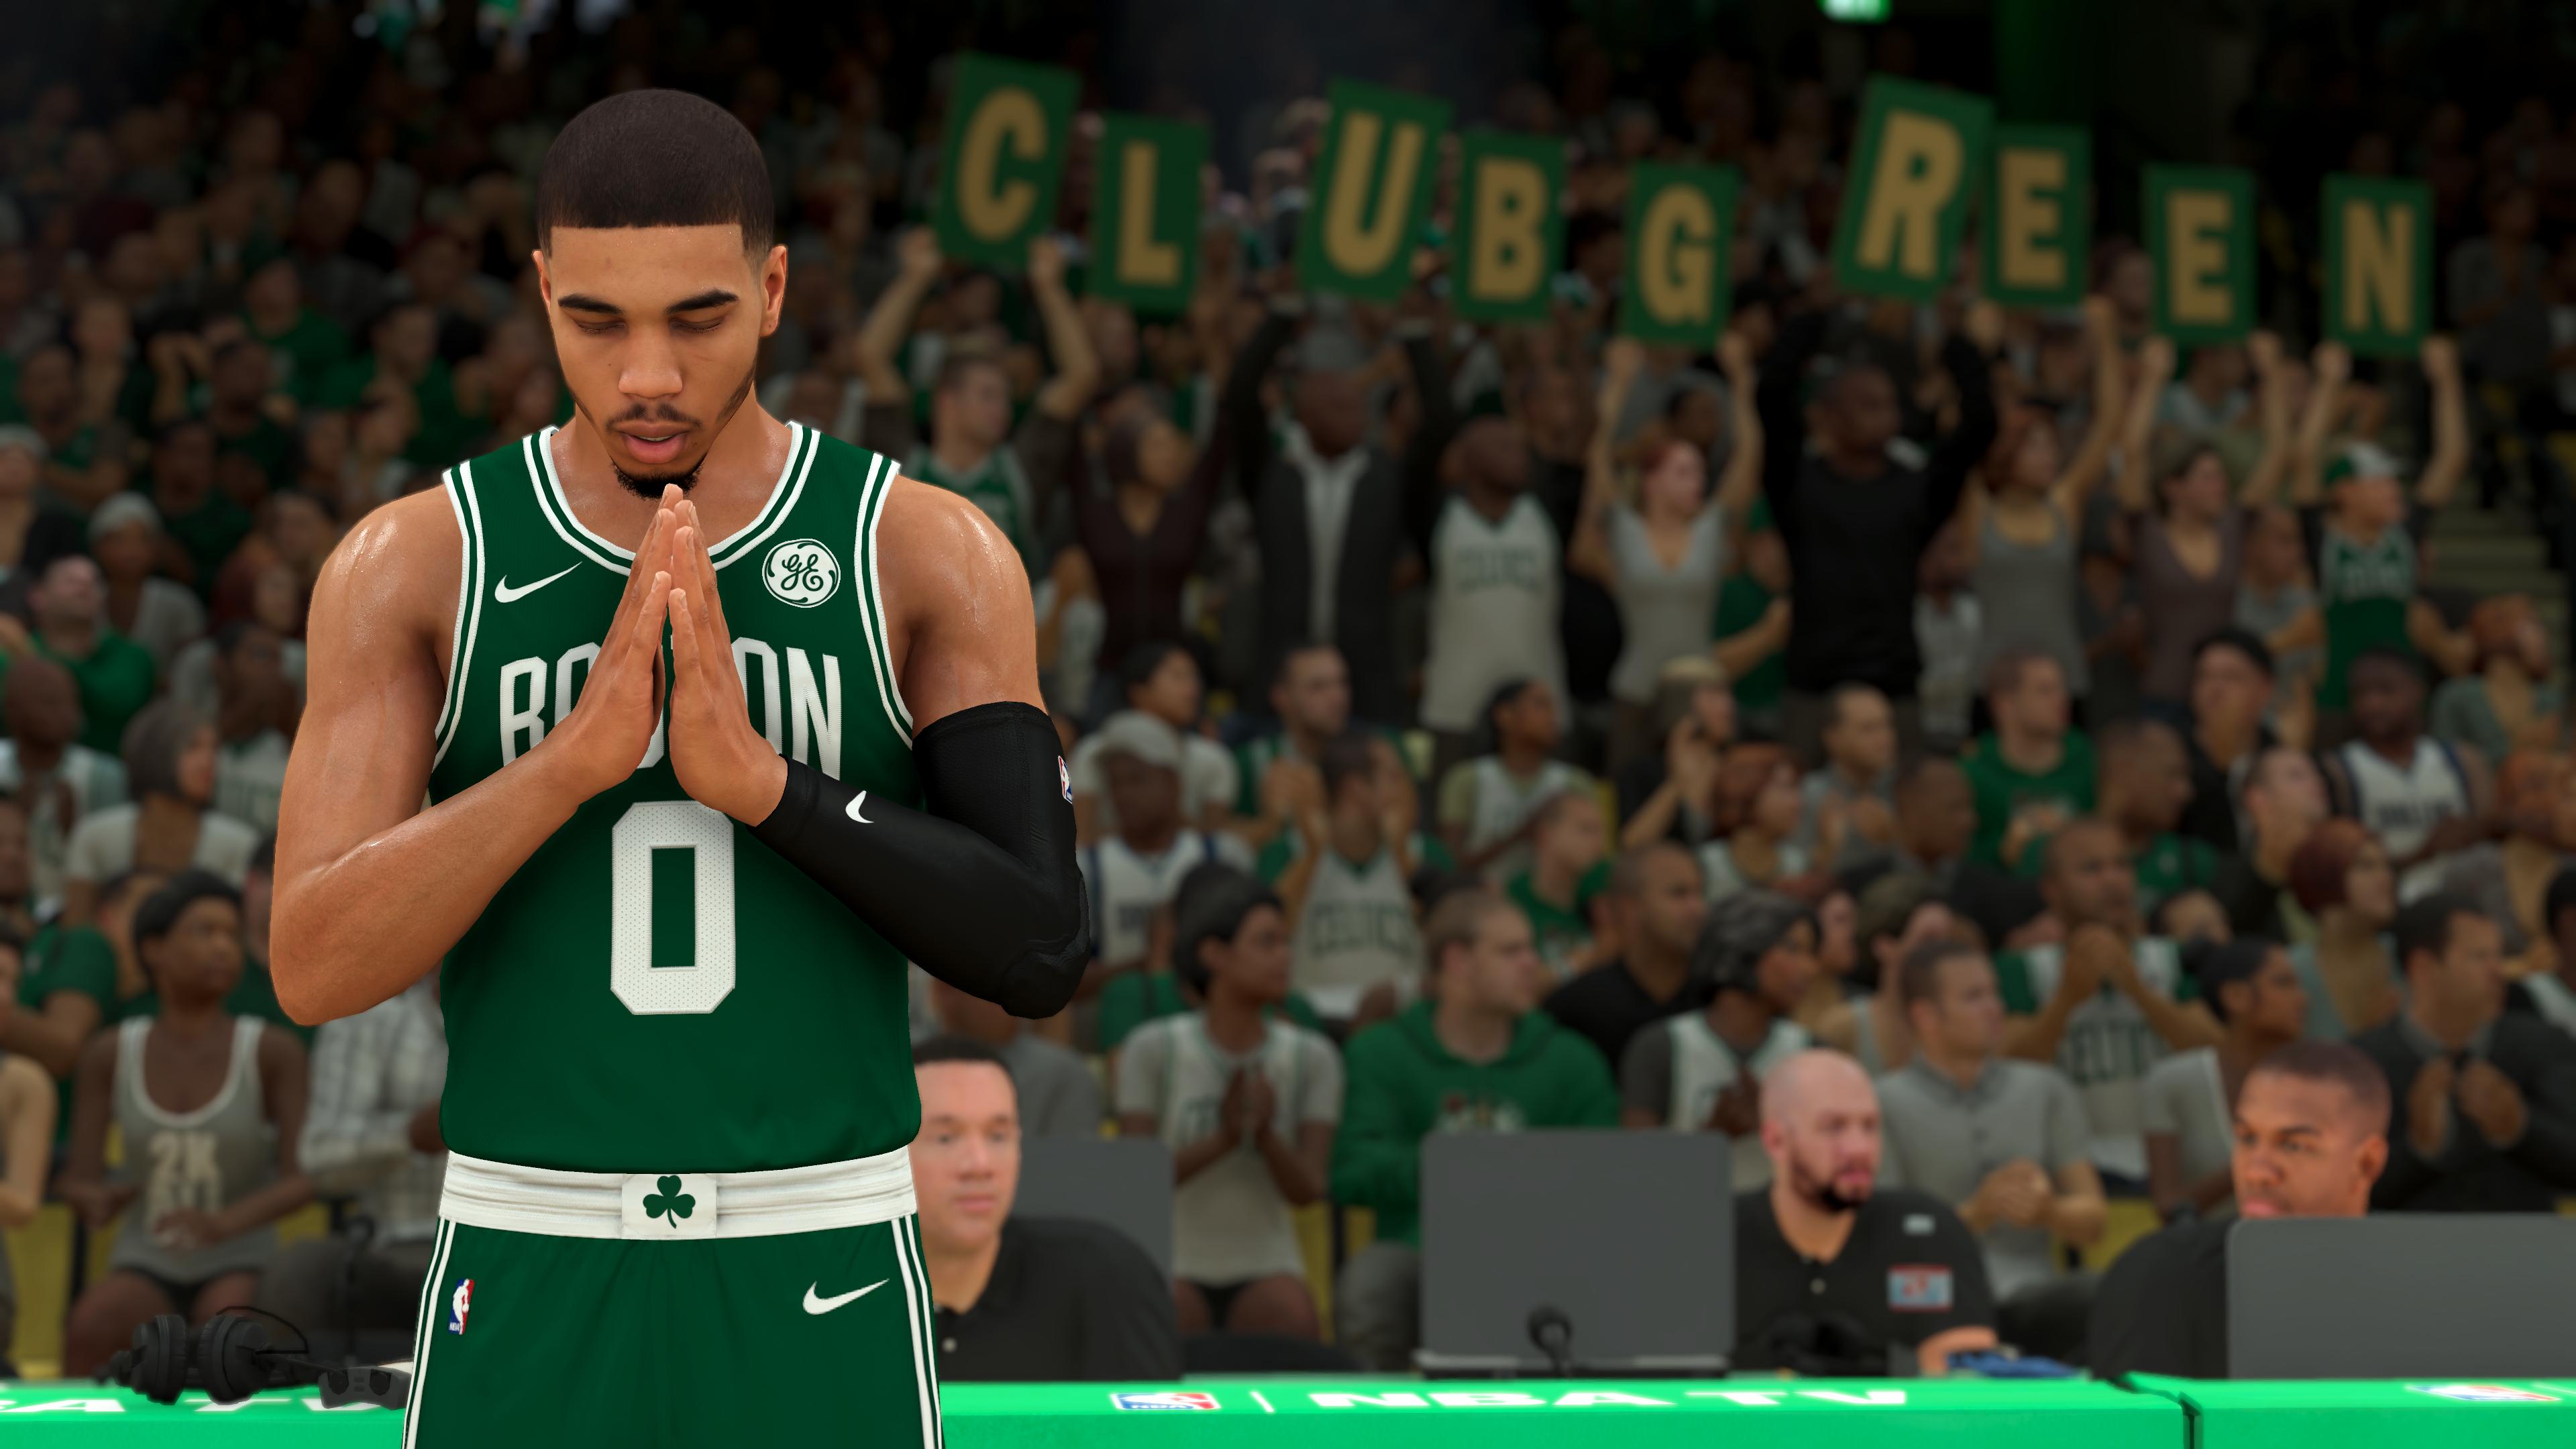 NBA-2K21 CG - Jayson Tatum Hands Clasped